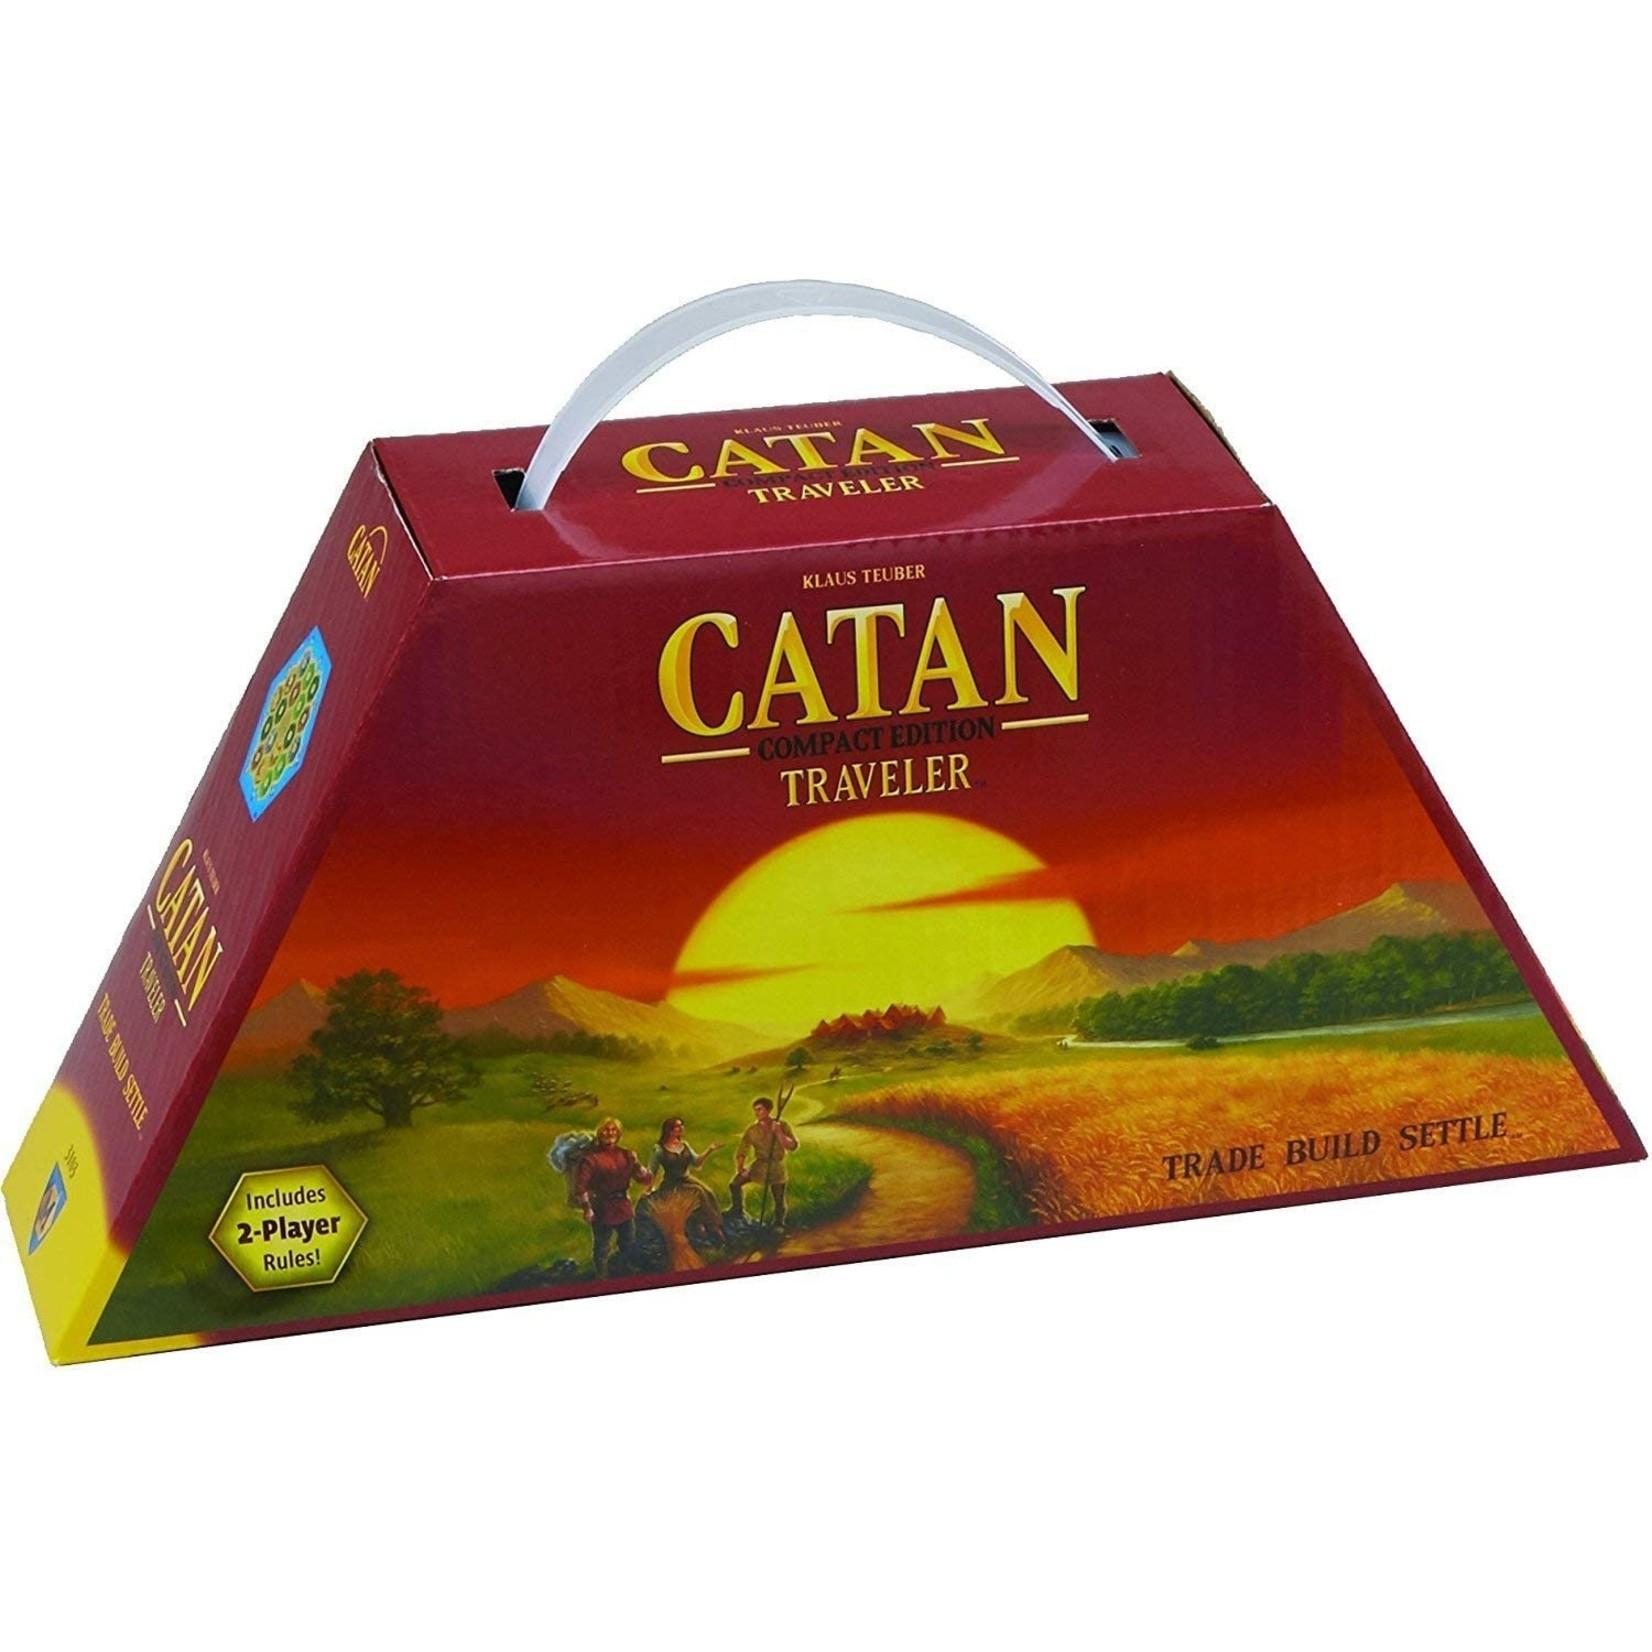 Catan Studios Inc. Catan: Traveler